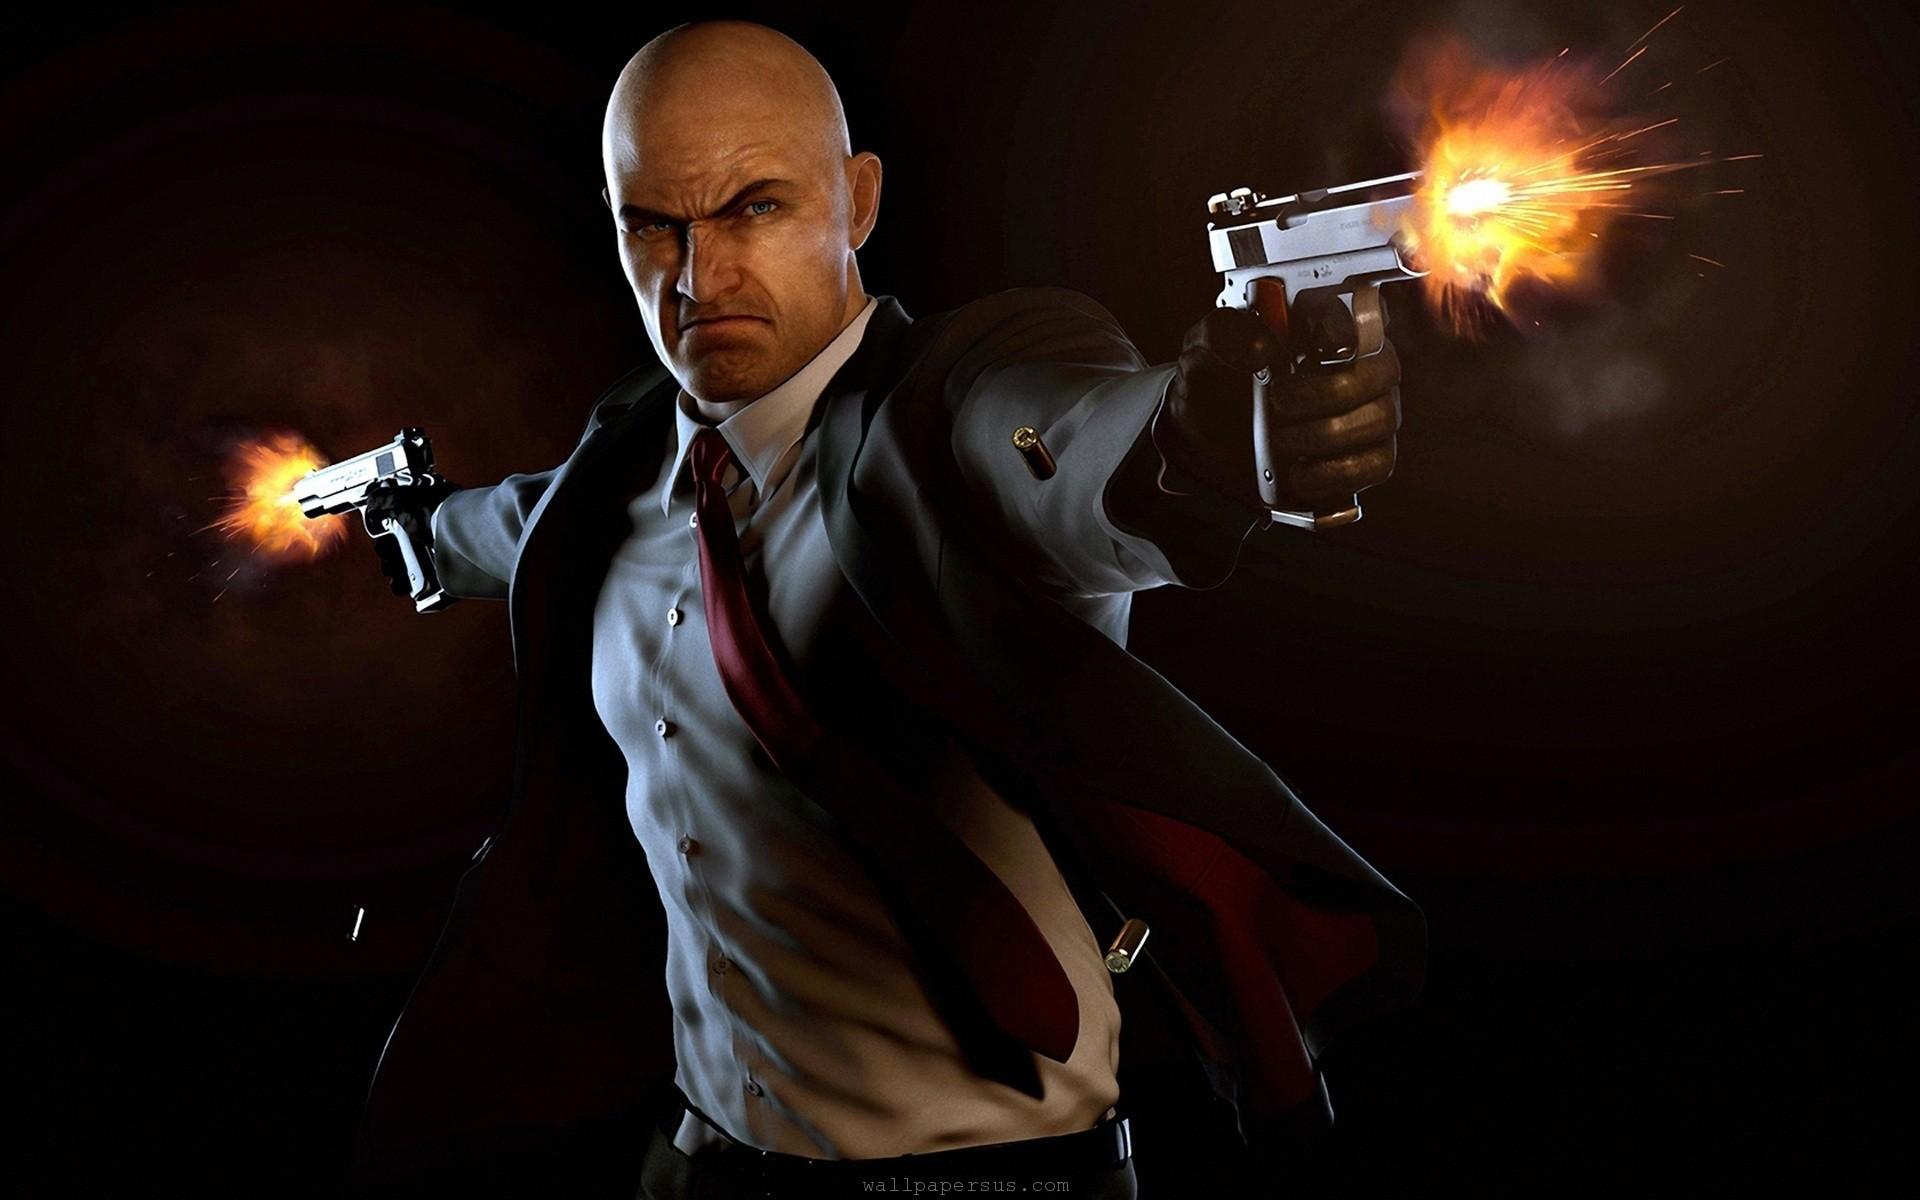 hitman-absolution-video-games-guns-us-com